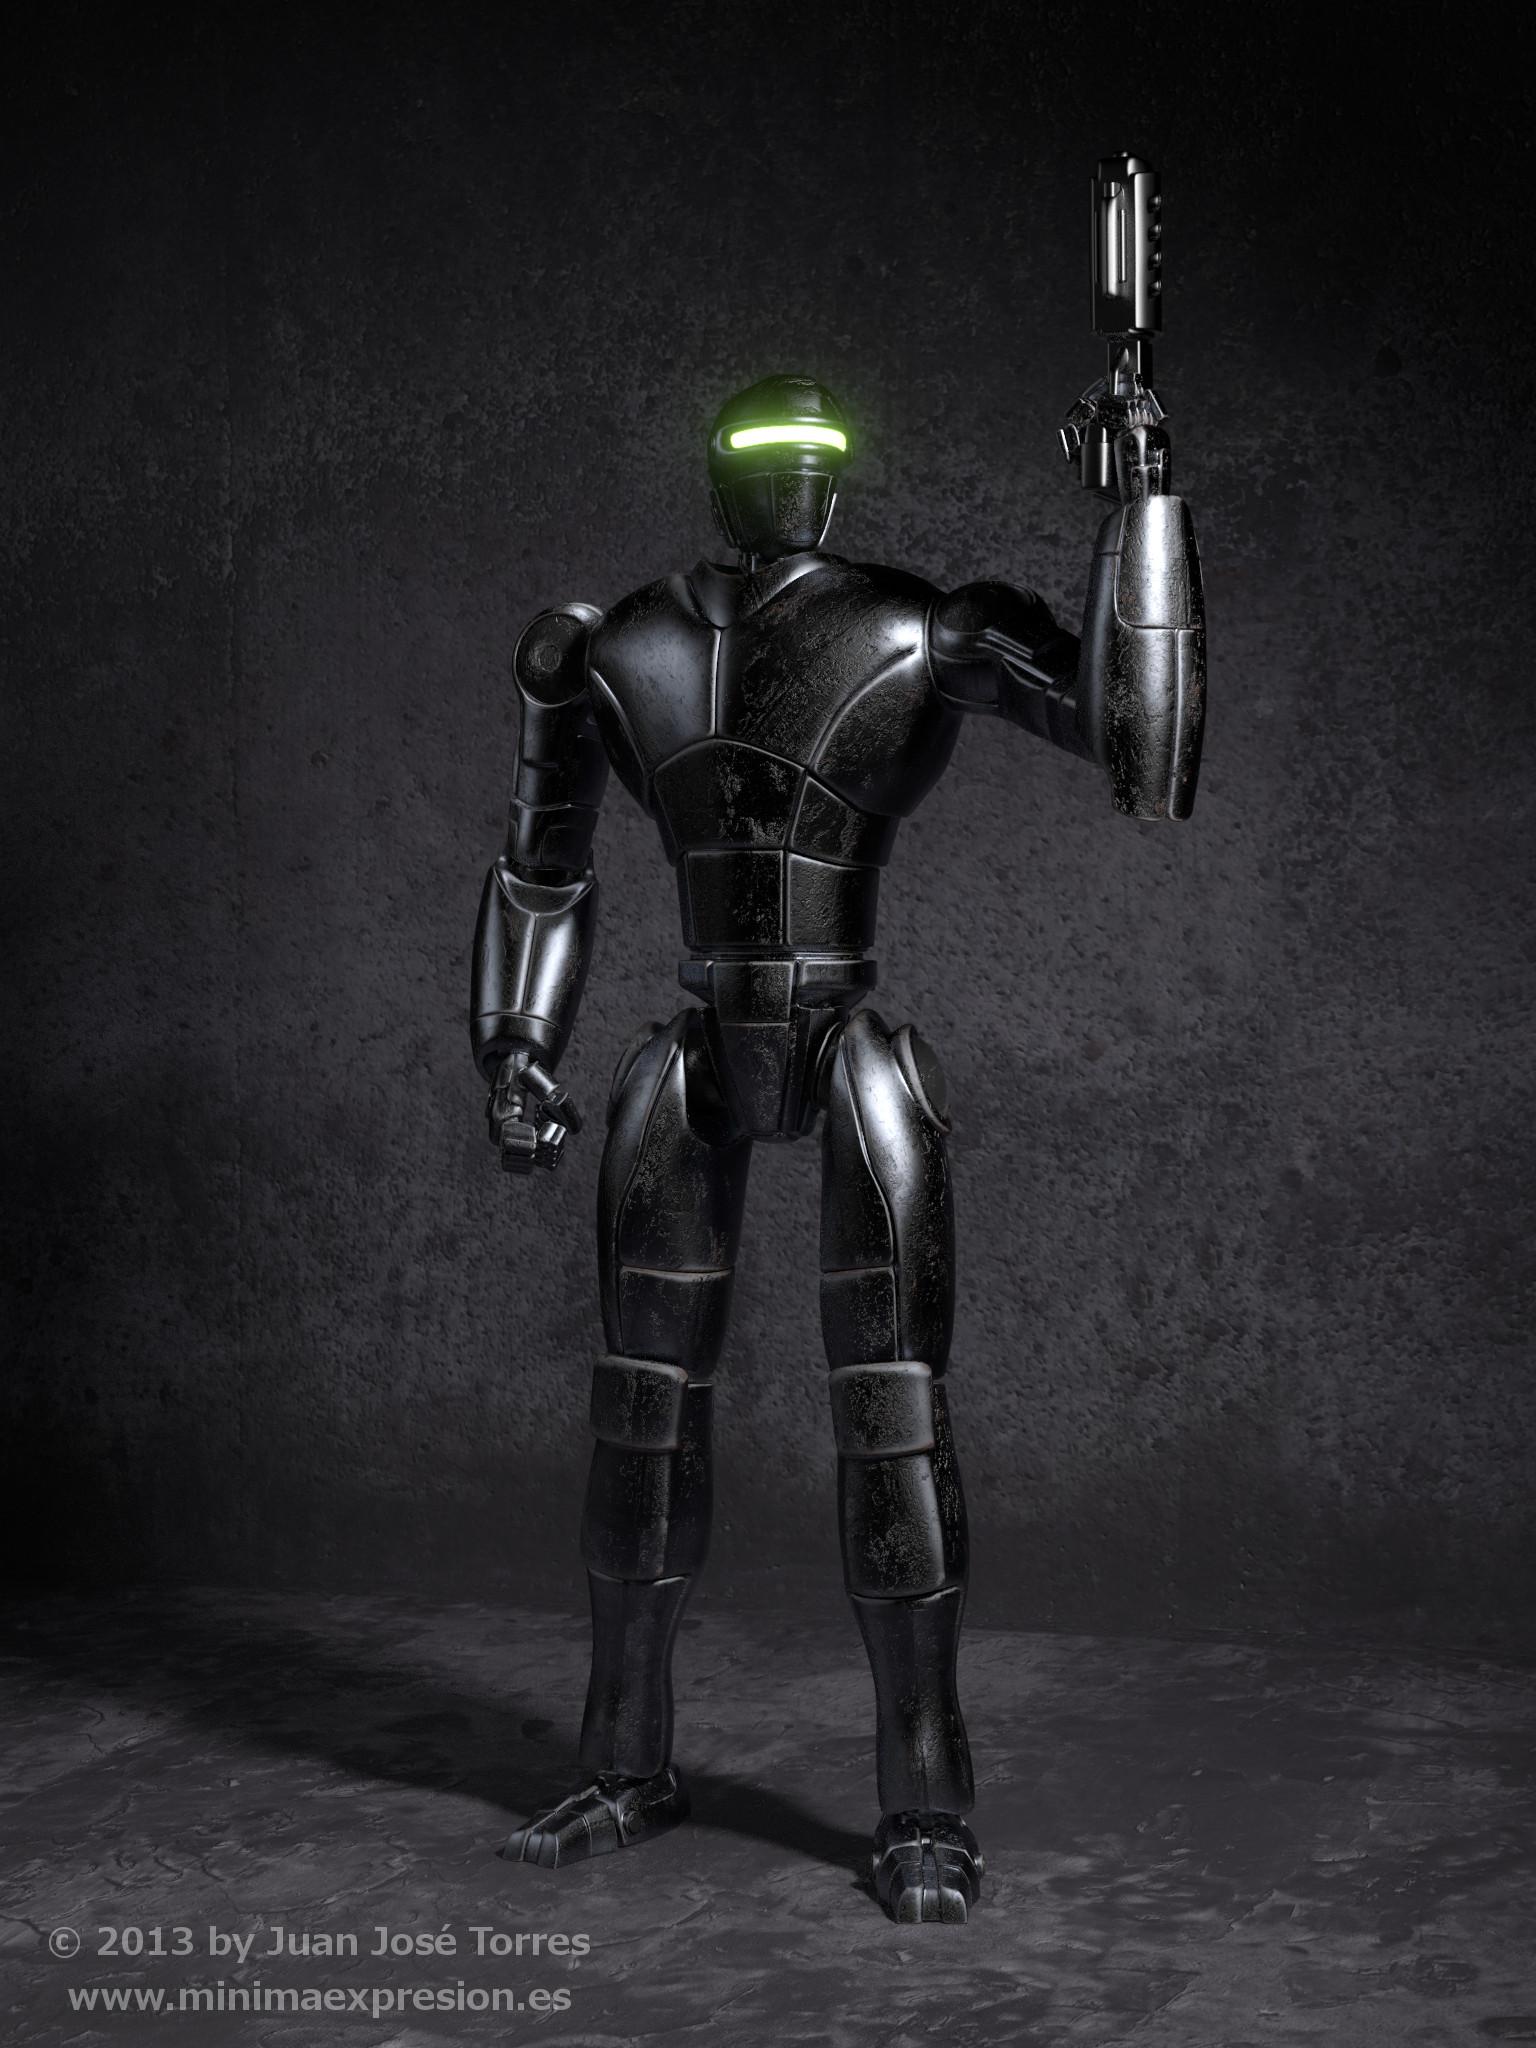 Robot Concept - Texturing and Shading (November 2013)